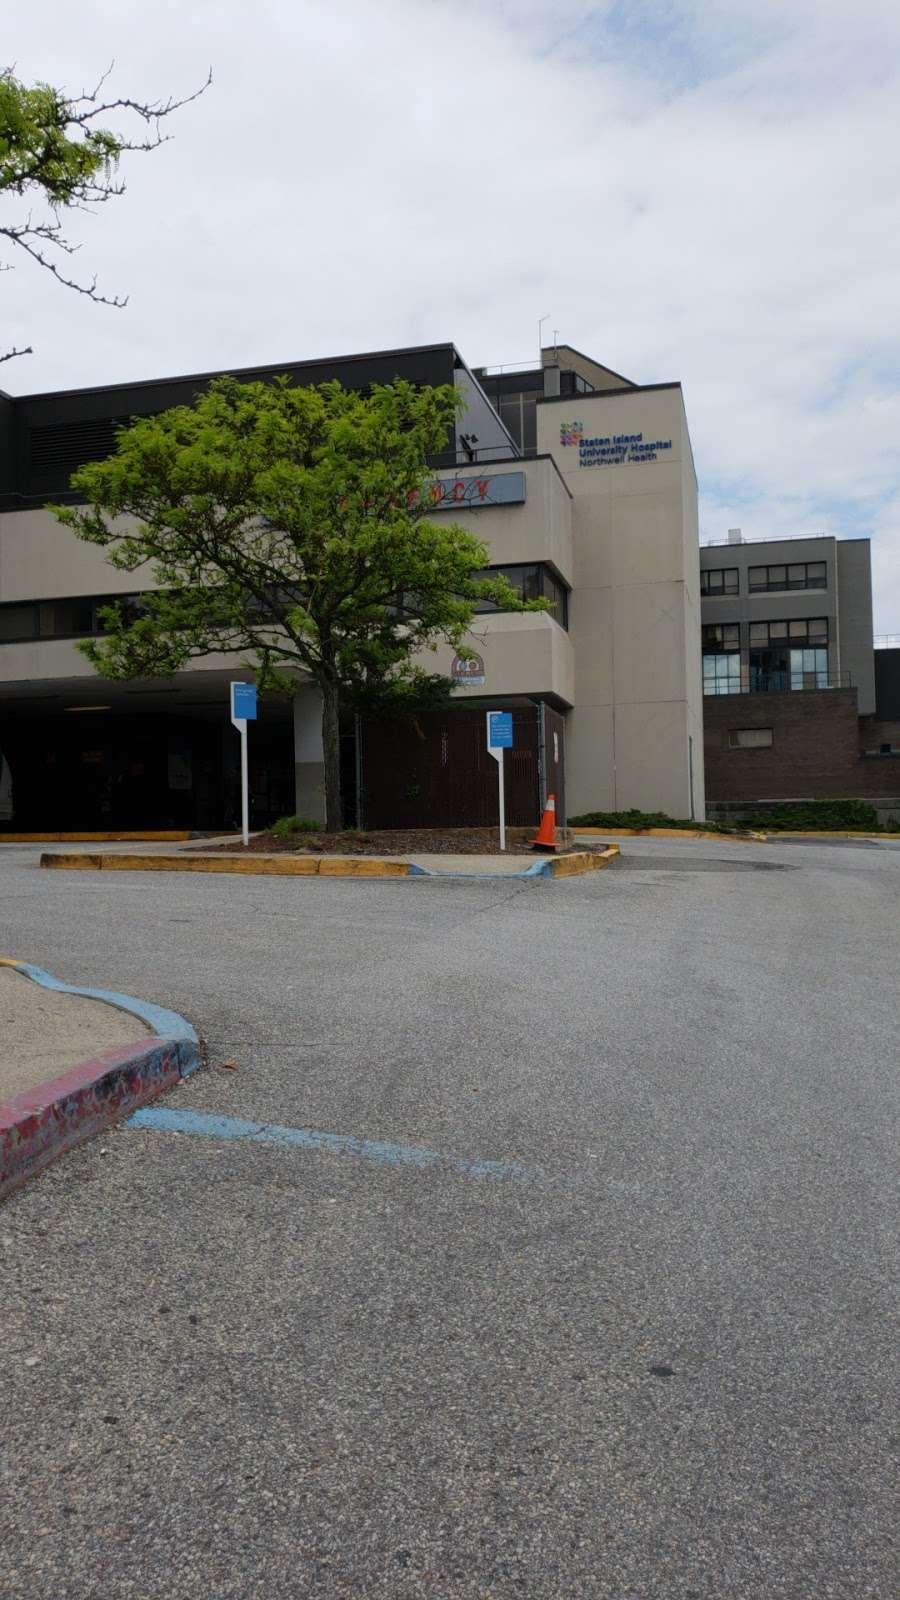 Staten Island University Hospital - hospital  | Photo 2 of 2 | Address: 392 Seguine Ave, Staten Island, NY 10309, USA | Phone: (718) 226-2274